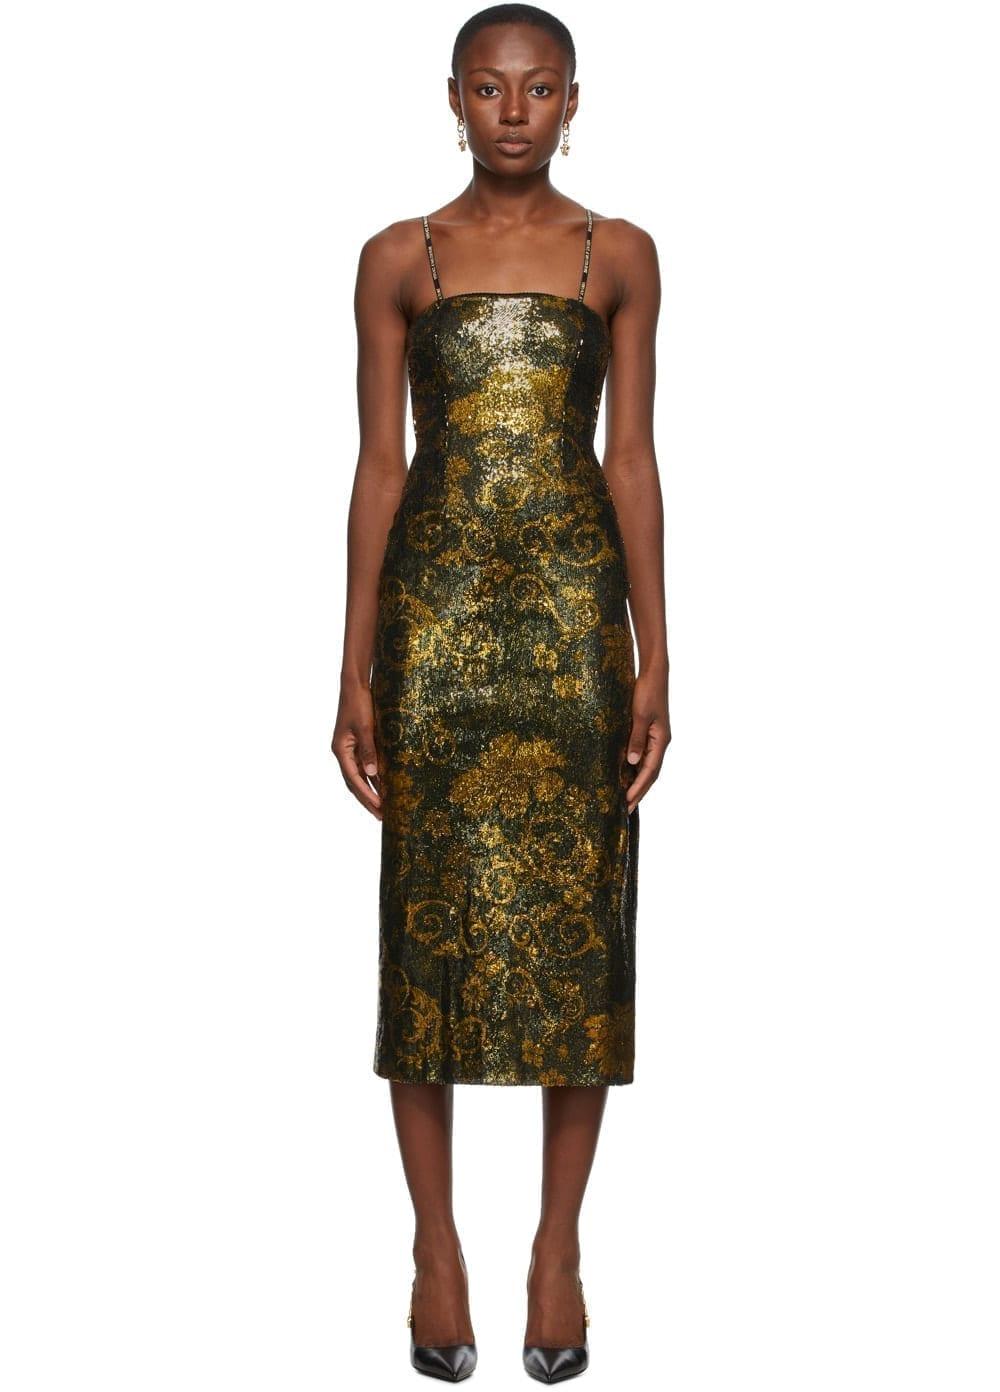 VERSACE JEANS COUTURE Black & Gold Glitter Midi Dress